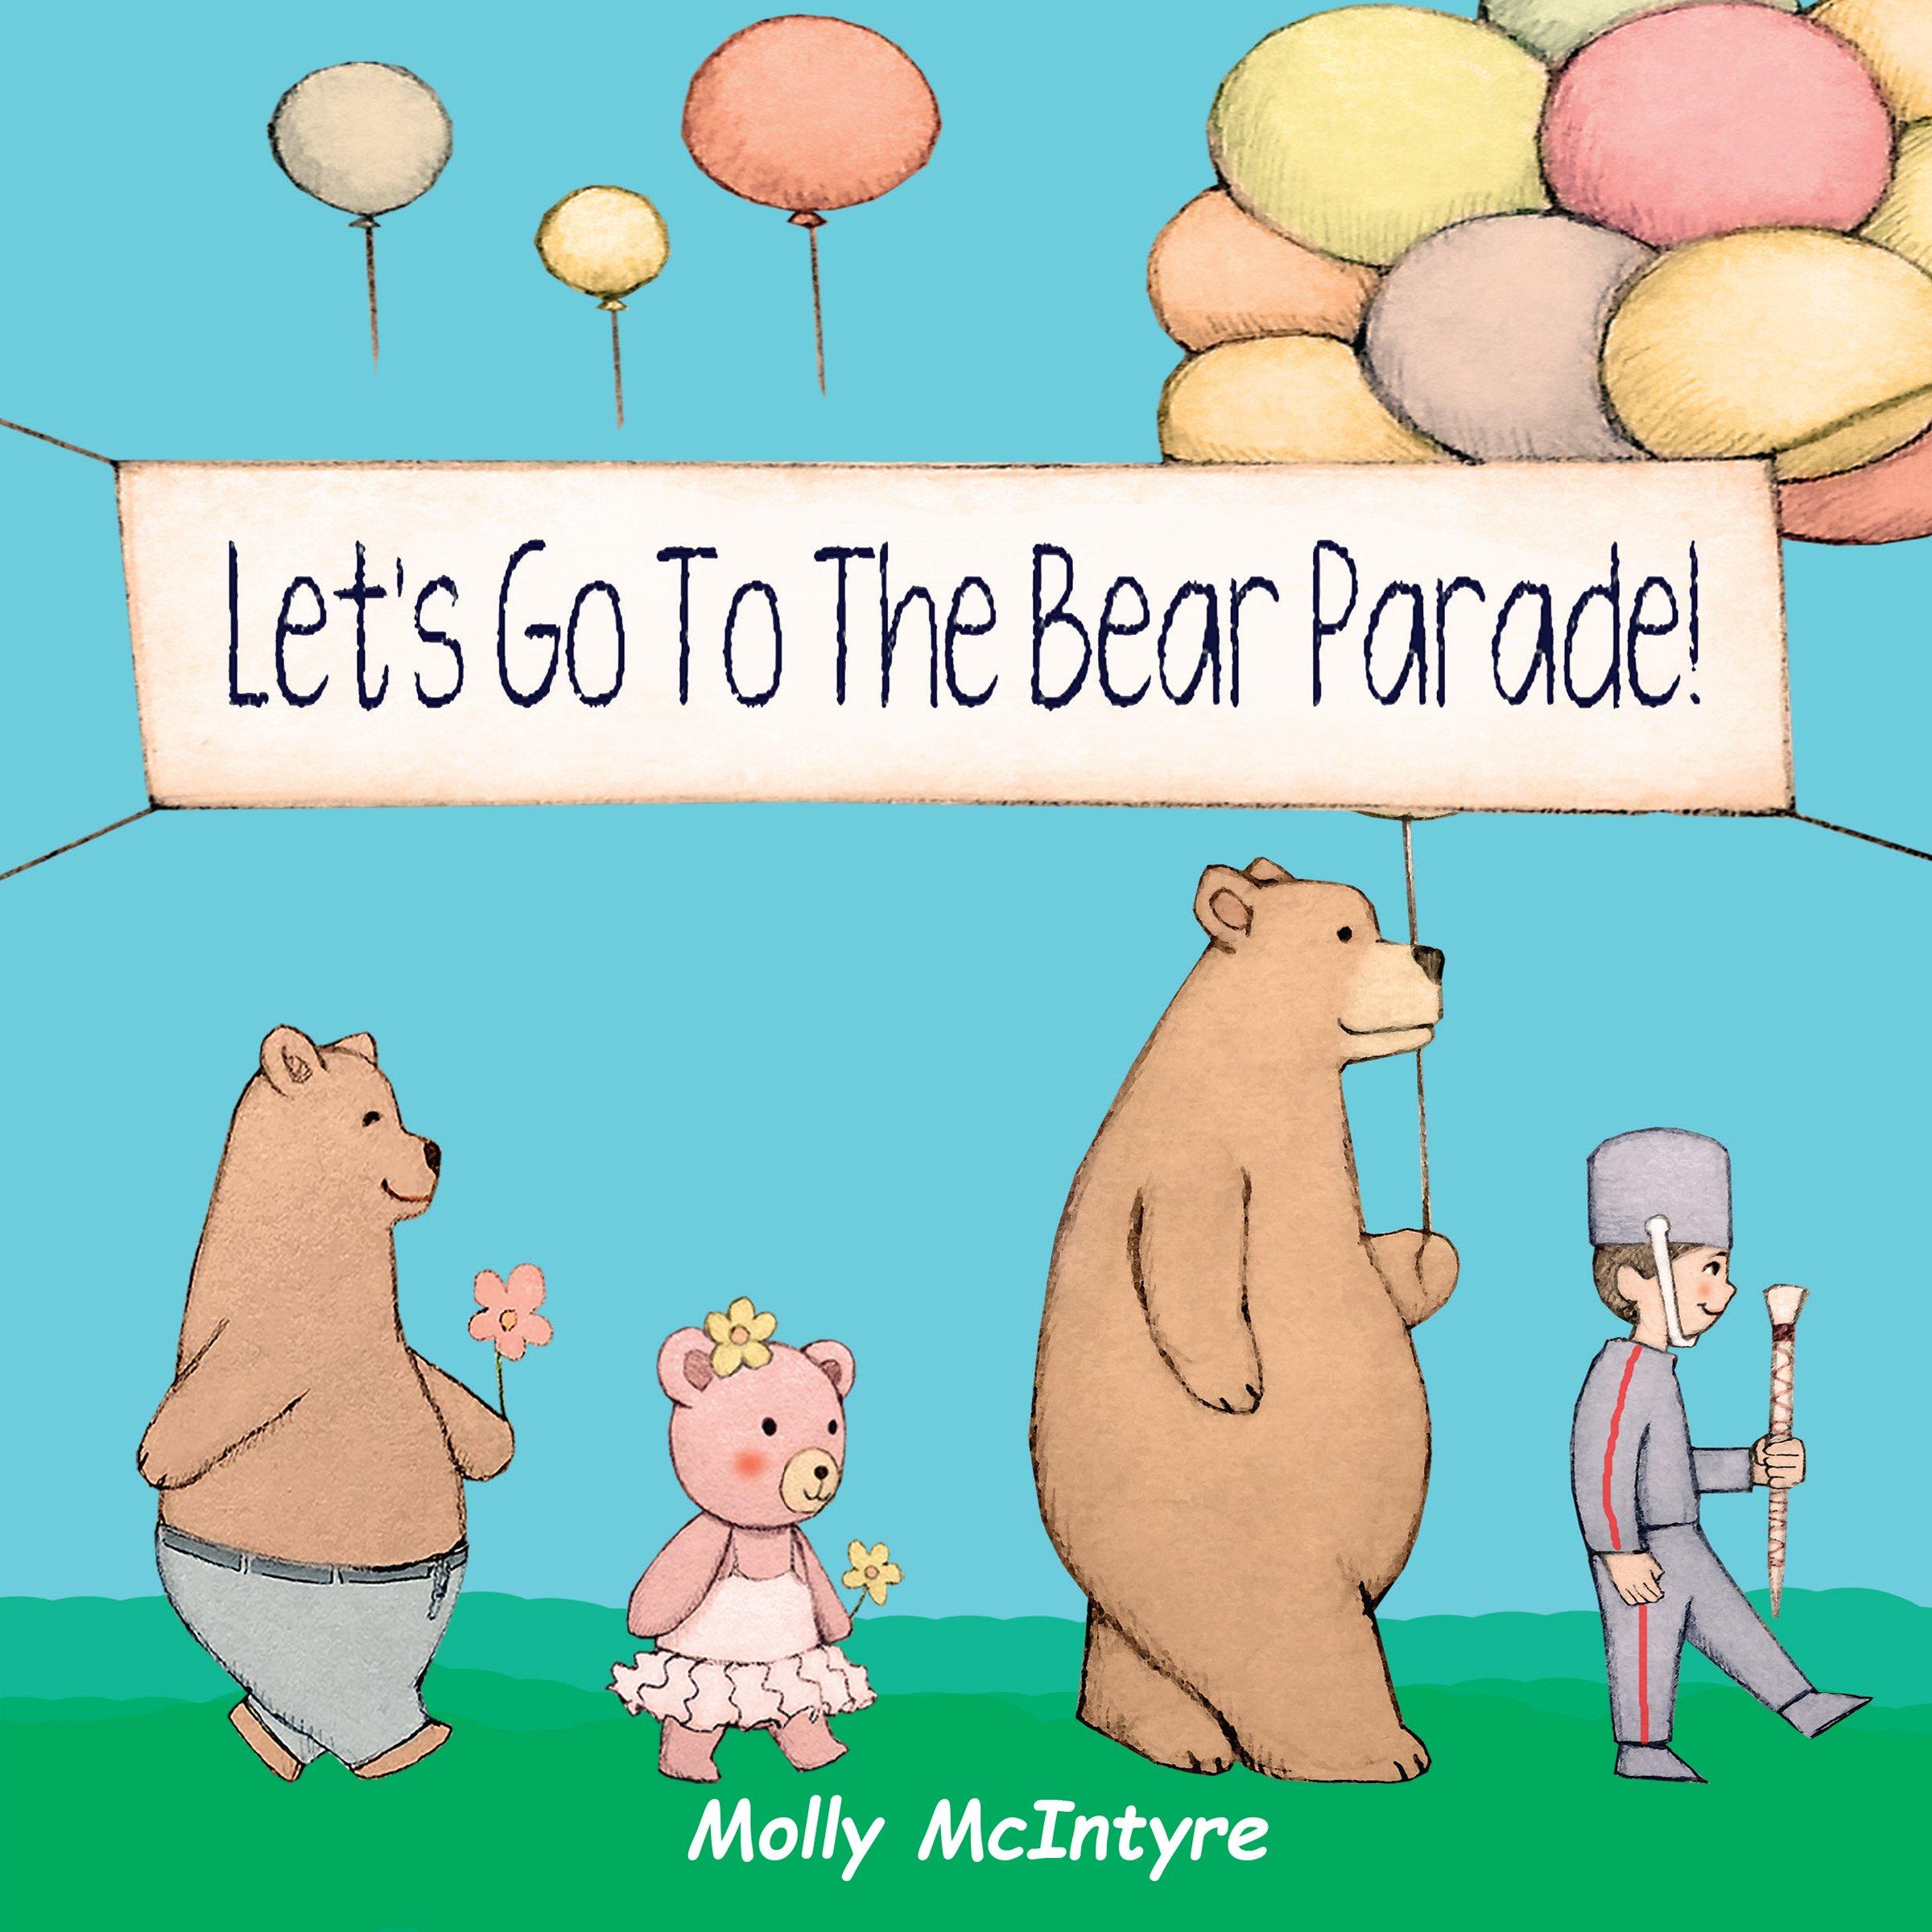 Let's Go To The Bear Parade: Molly McIntyre: 9780997730524: Amazon.com:  Books